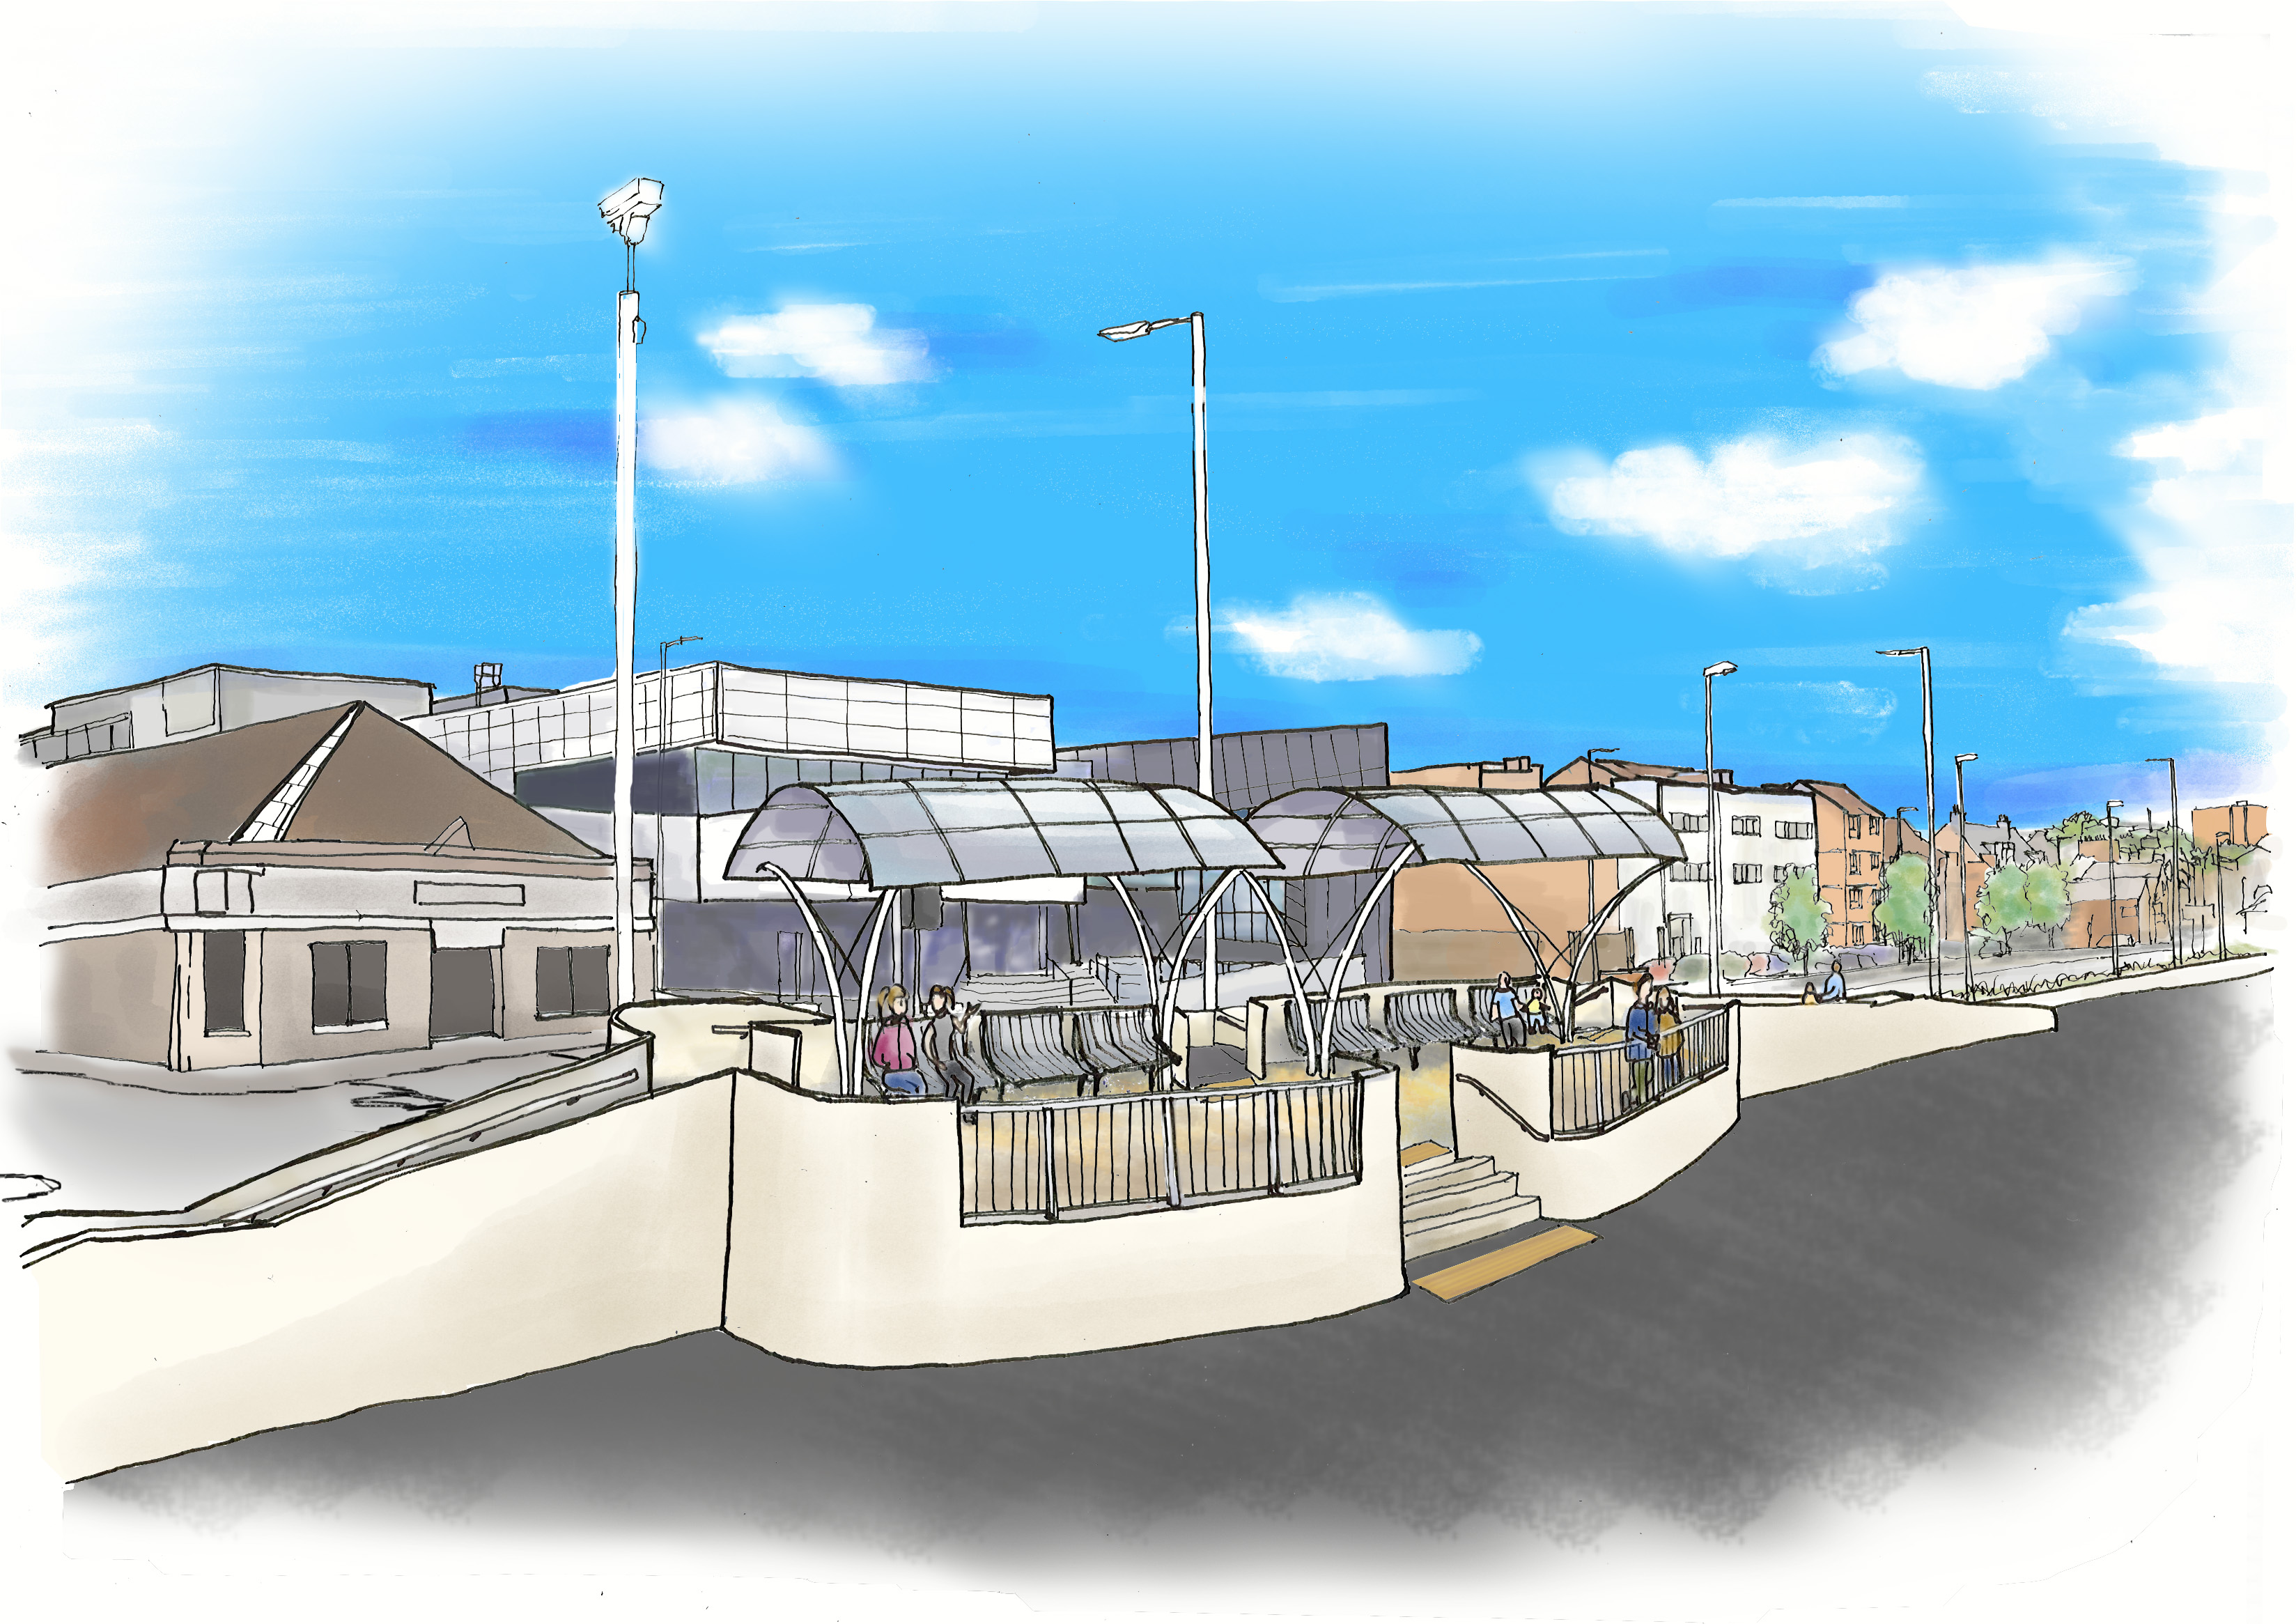 An artist's impression of the Kirkcaldy Esplanade viewing platform.